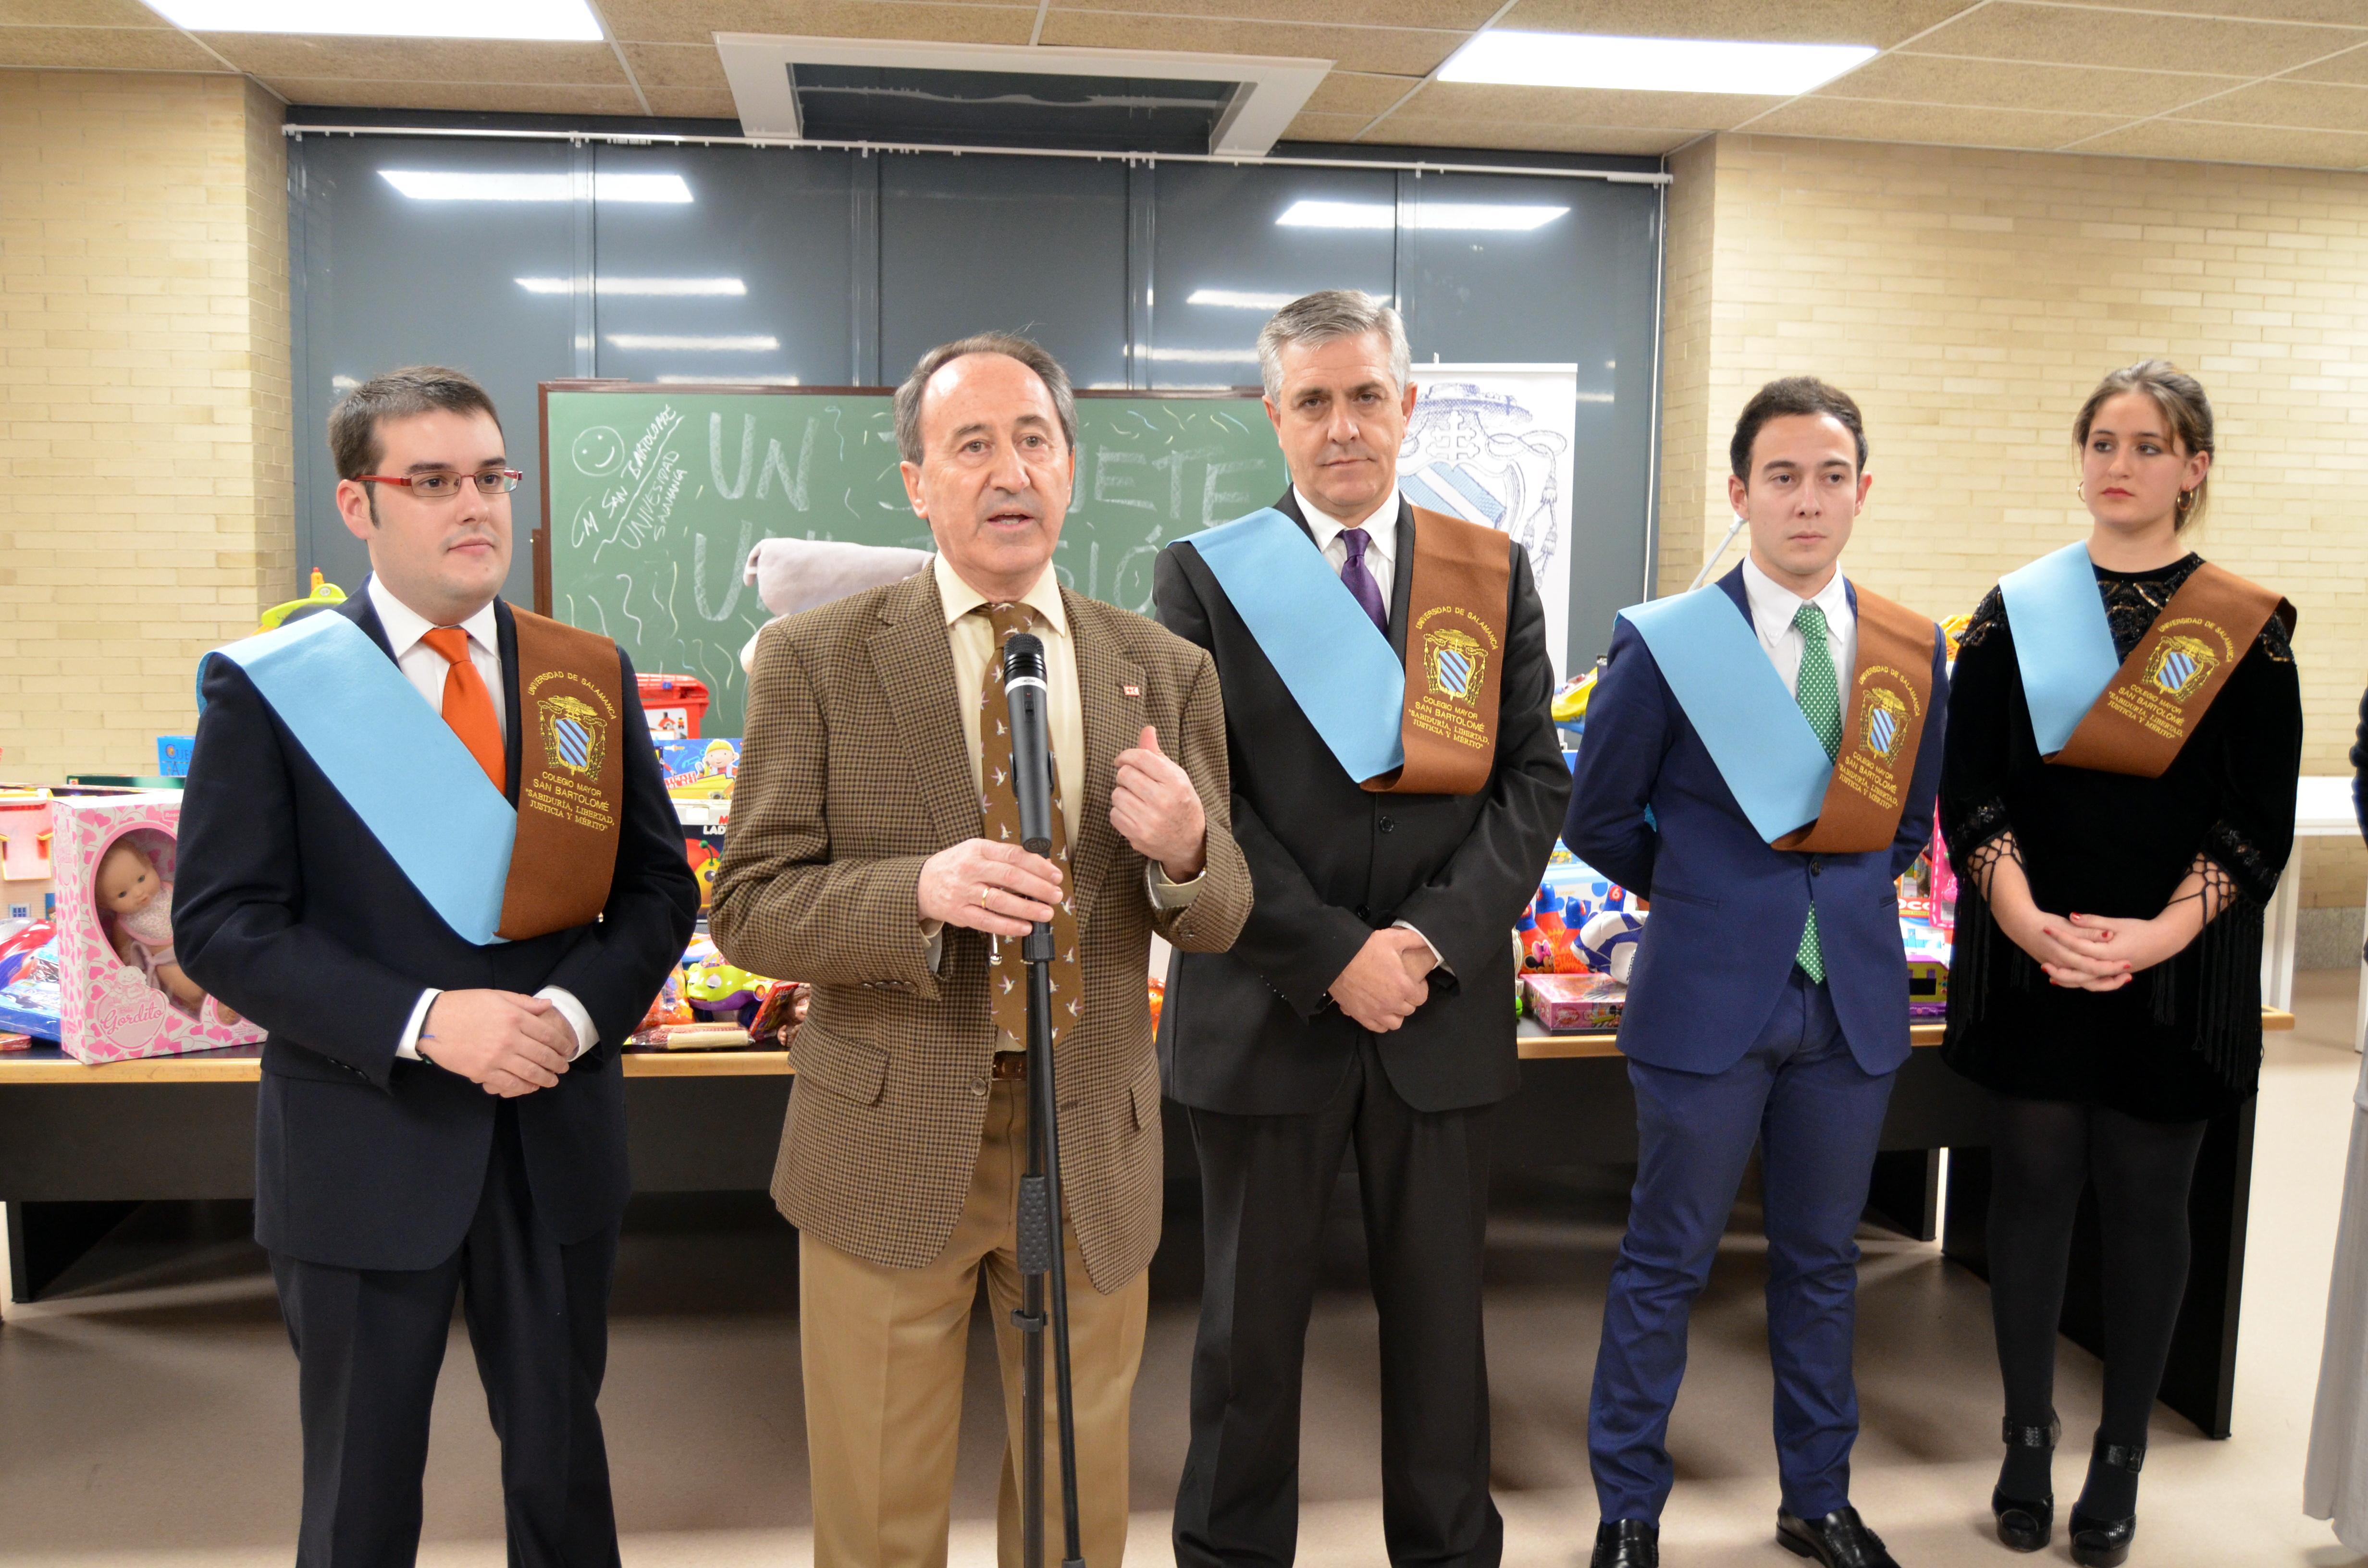 El Colegio Mayor San Bartolomé de la Universidad de Salamanca entrega 500 juguetes a Cruz Roja Salamanca